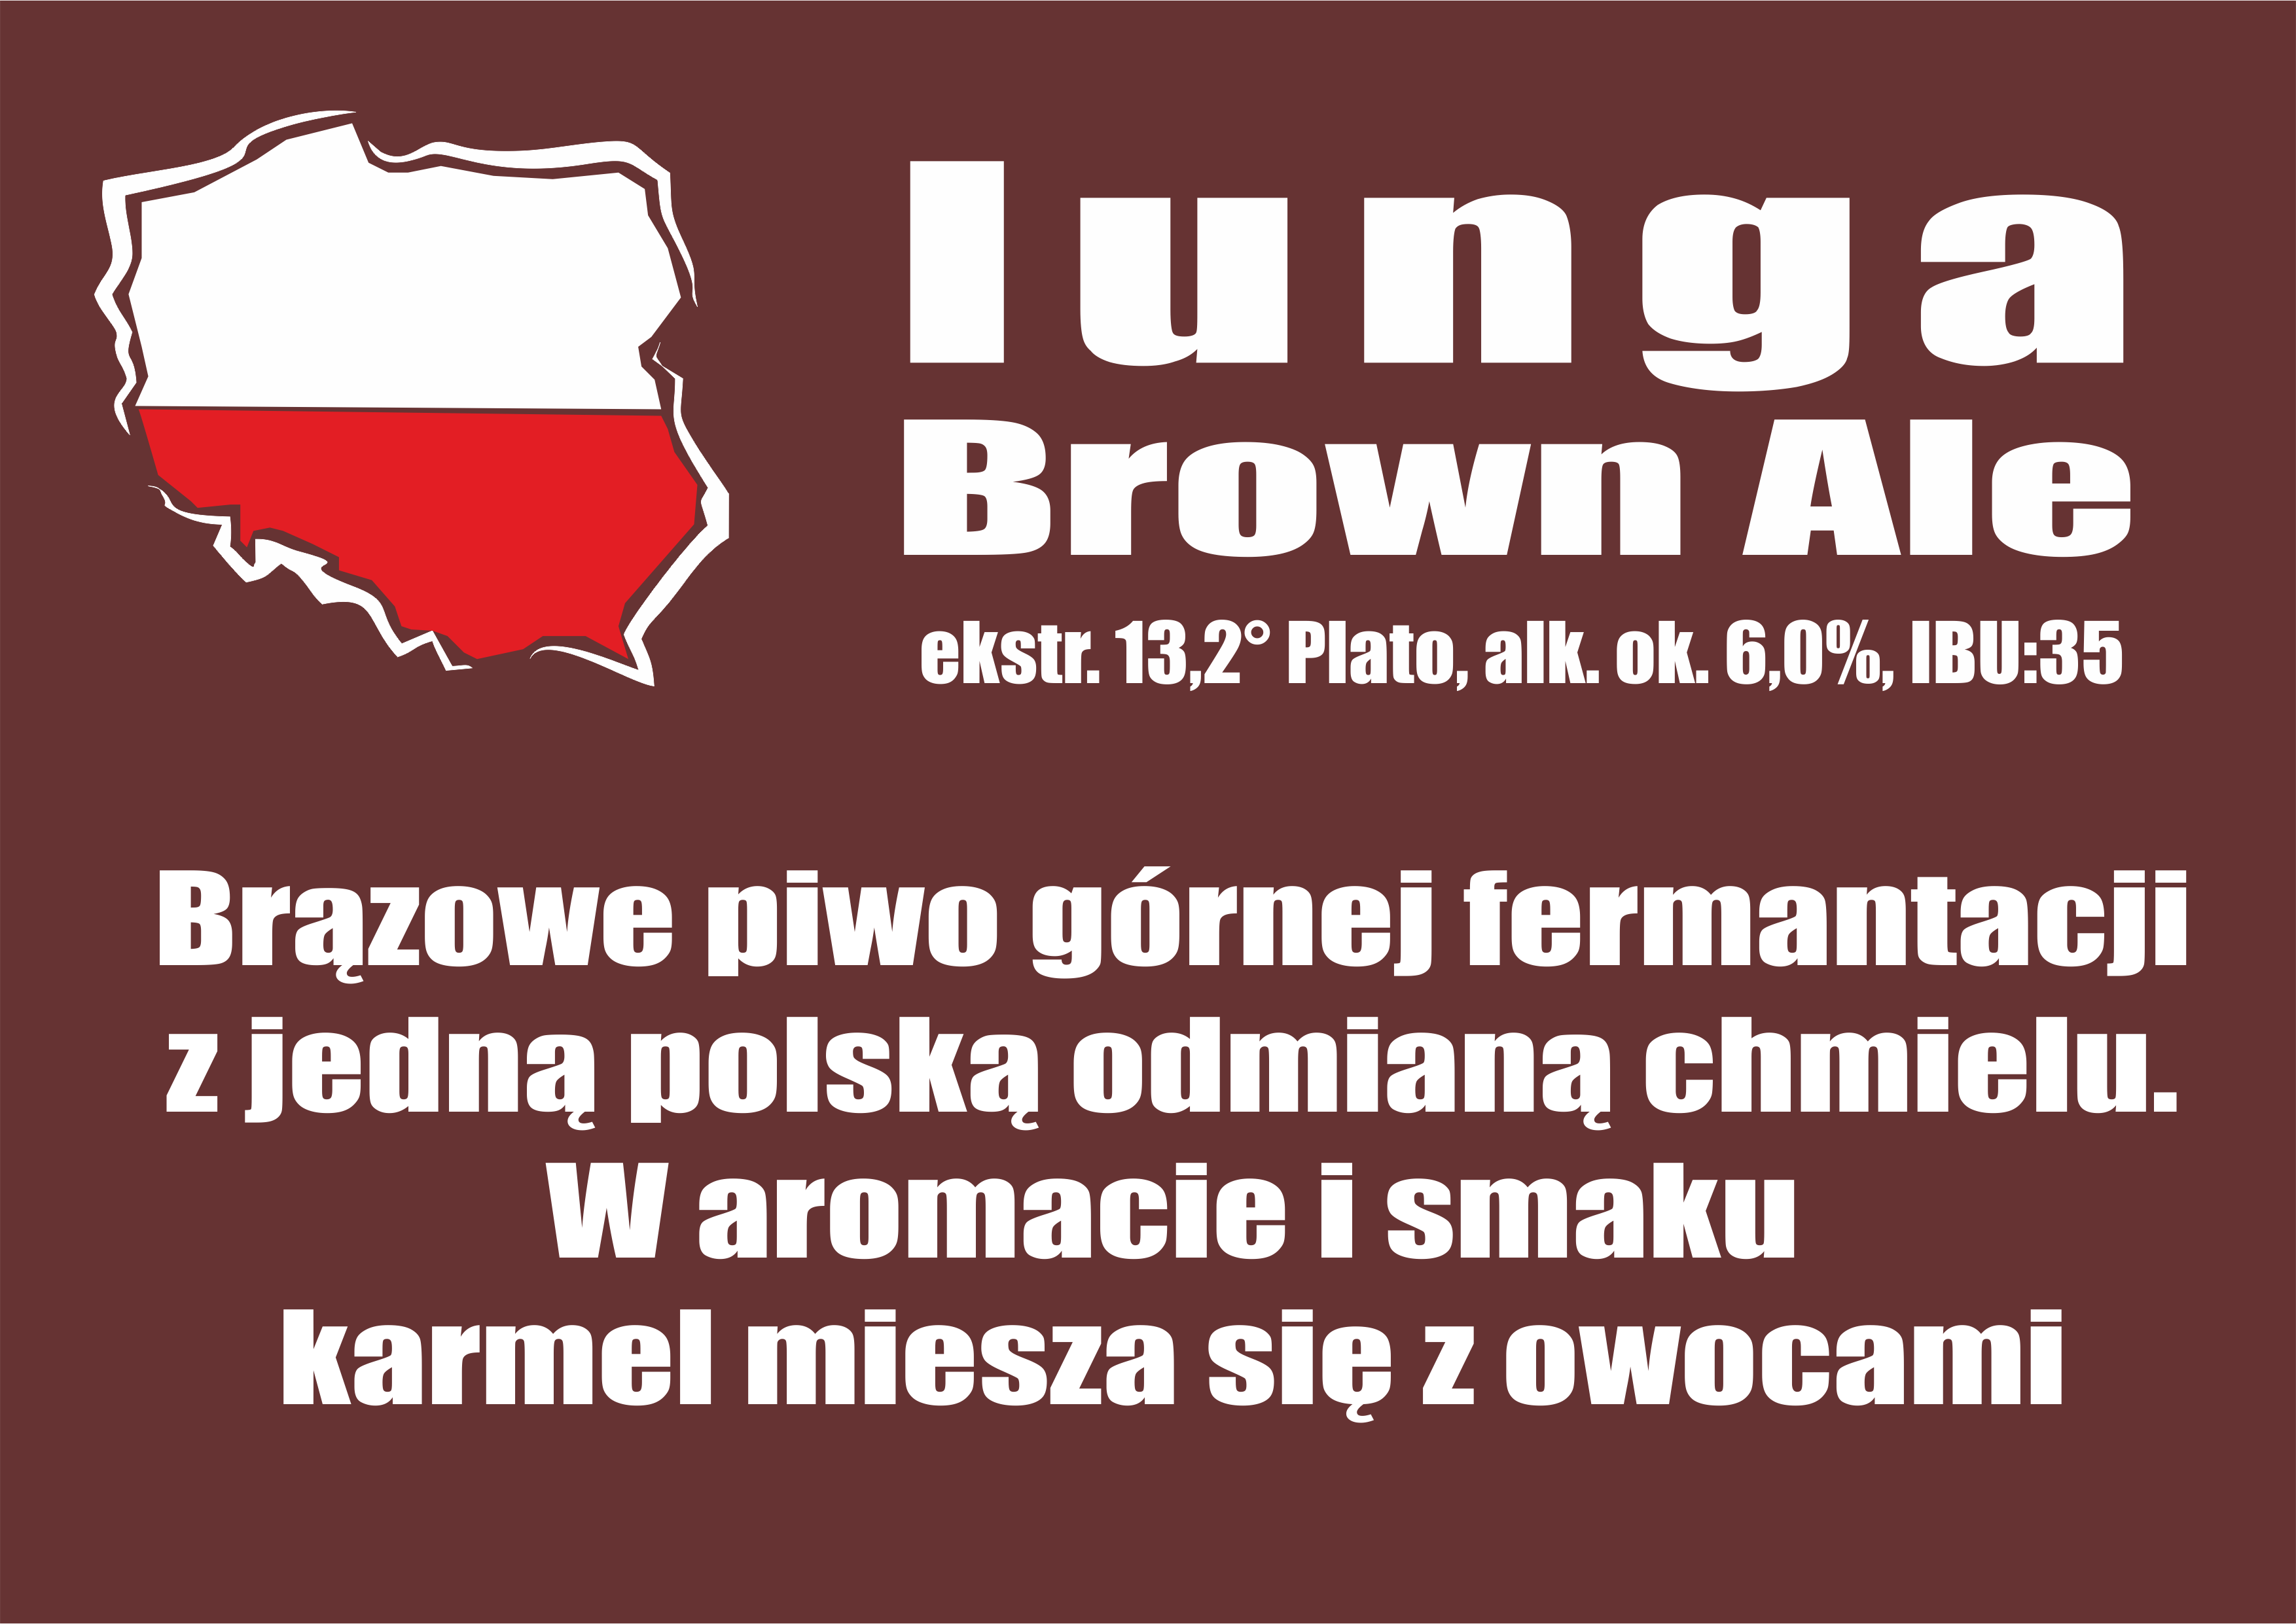 Iunga Brown Ale - na telewizor